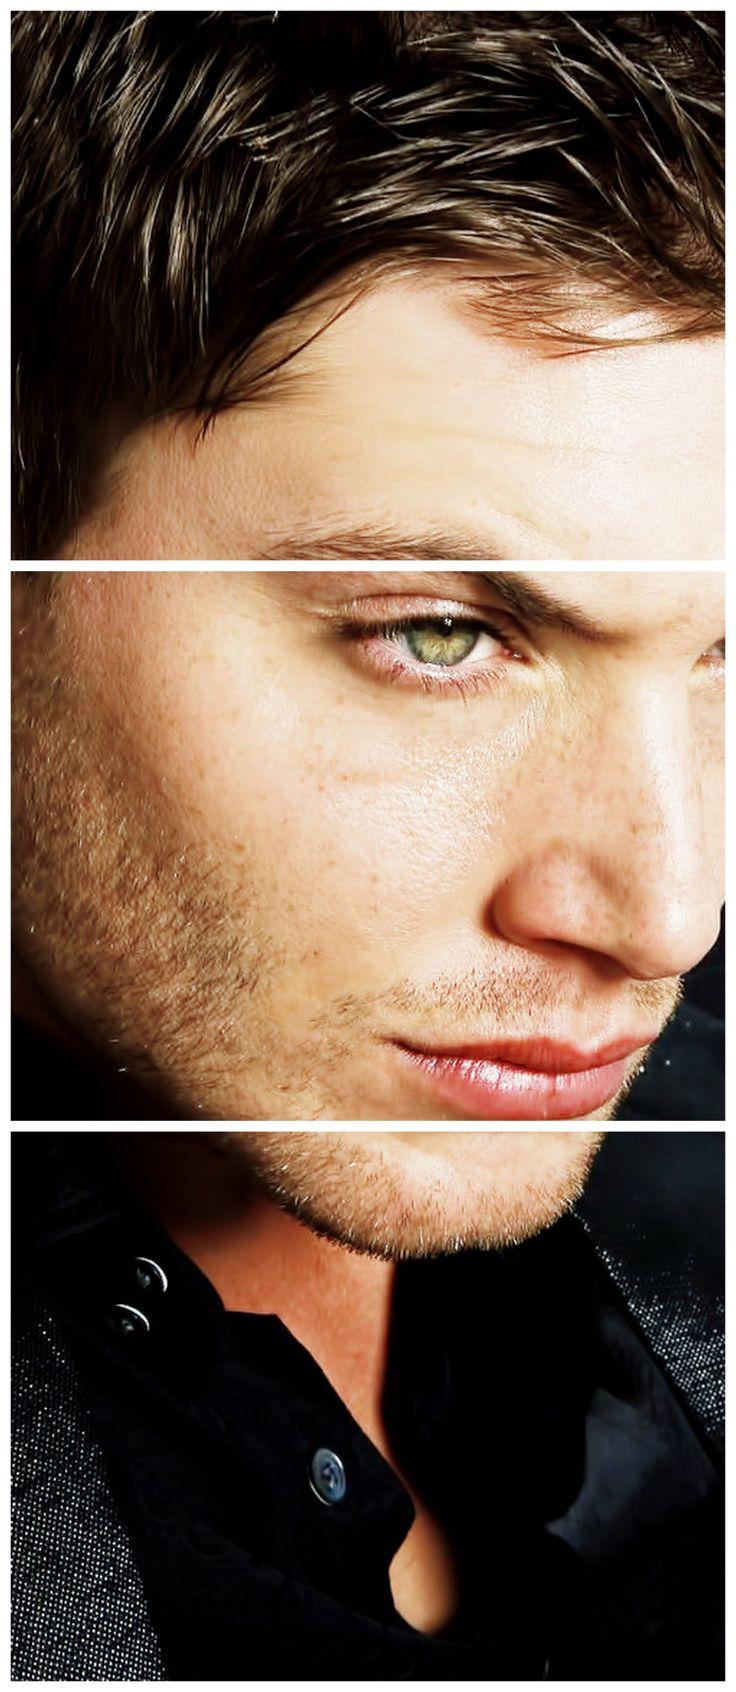 #JensenAckles photo shoot #stunning